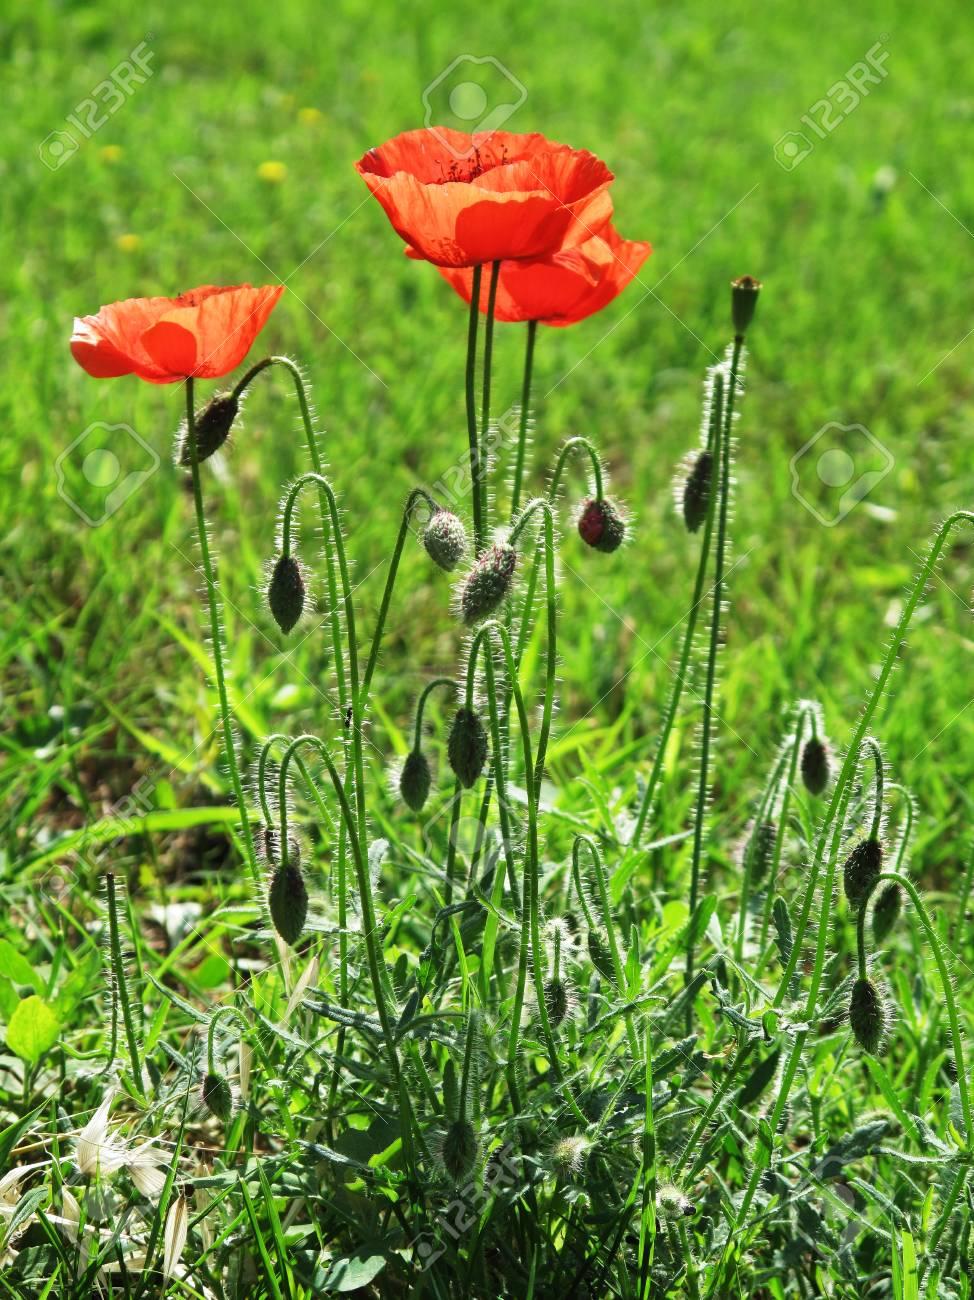 Poppy flower in the wild Stock Photo - 55145225